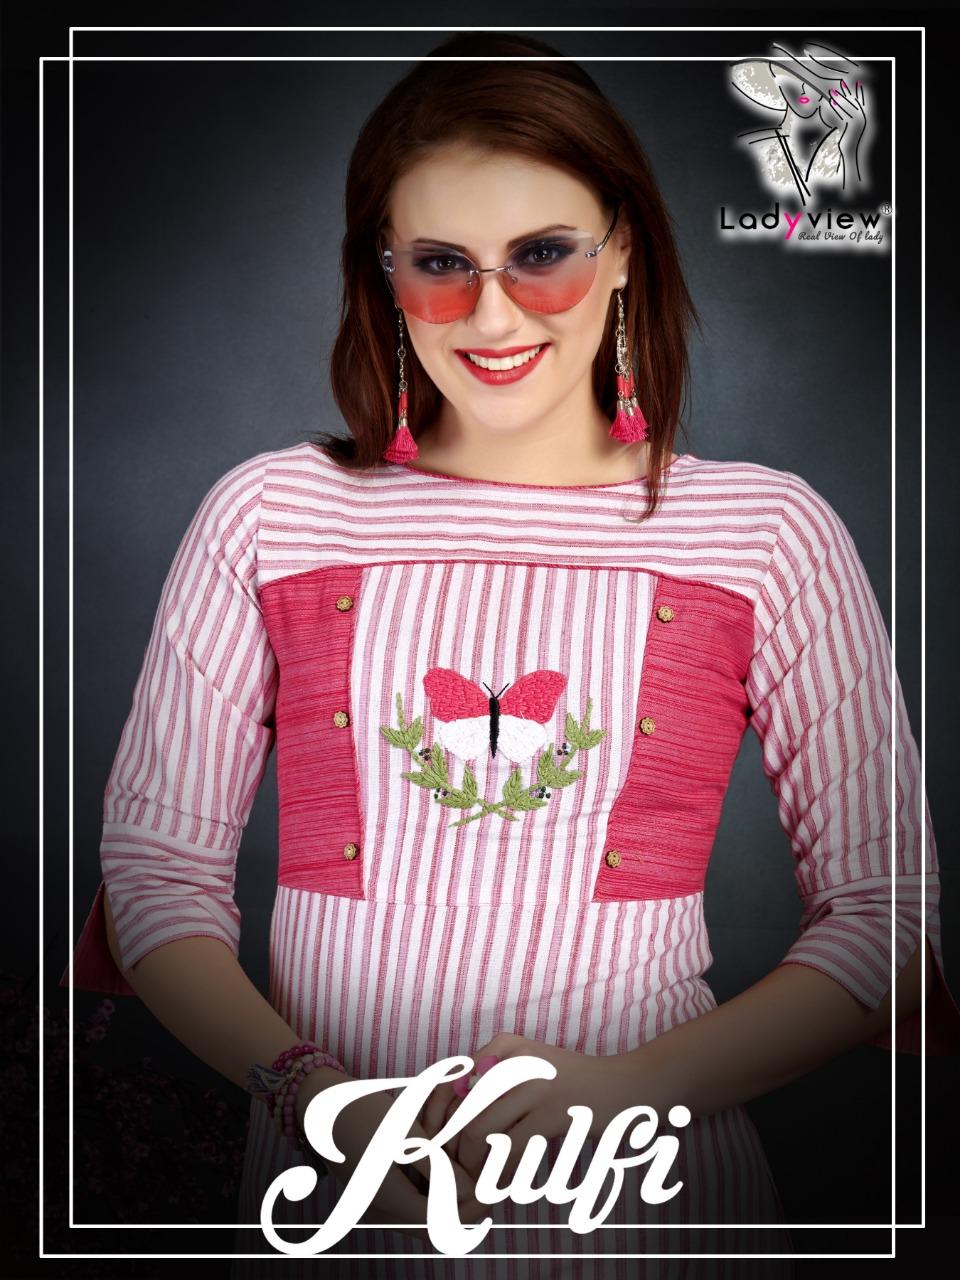 Ladyview kulfi cotton stripes kurties collection at wholesale price